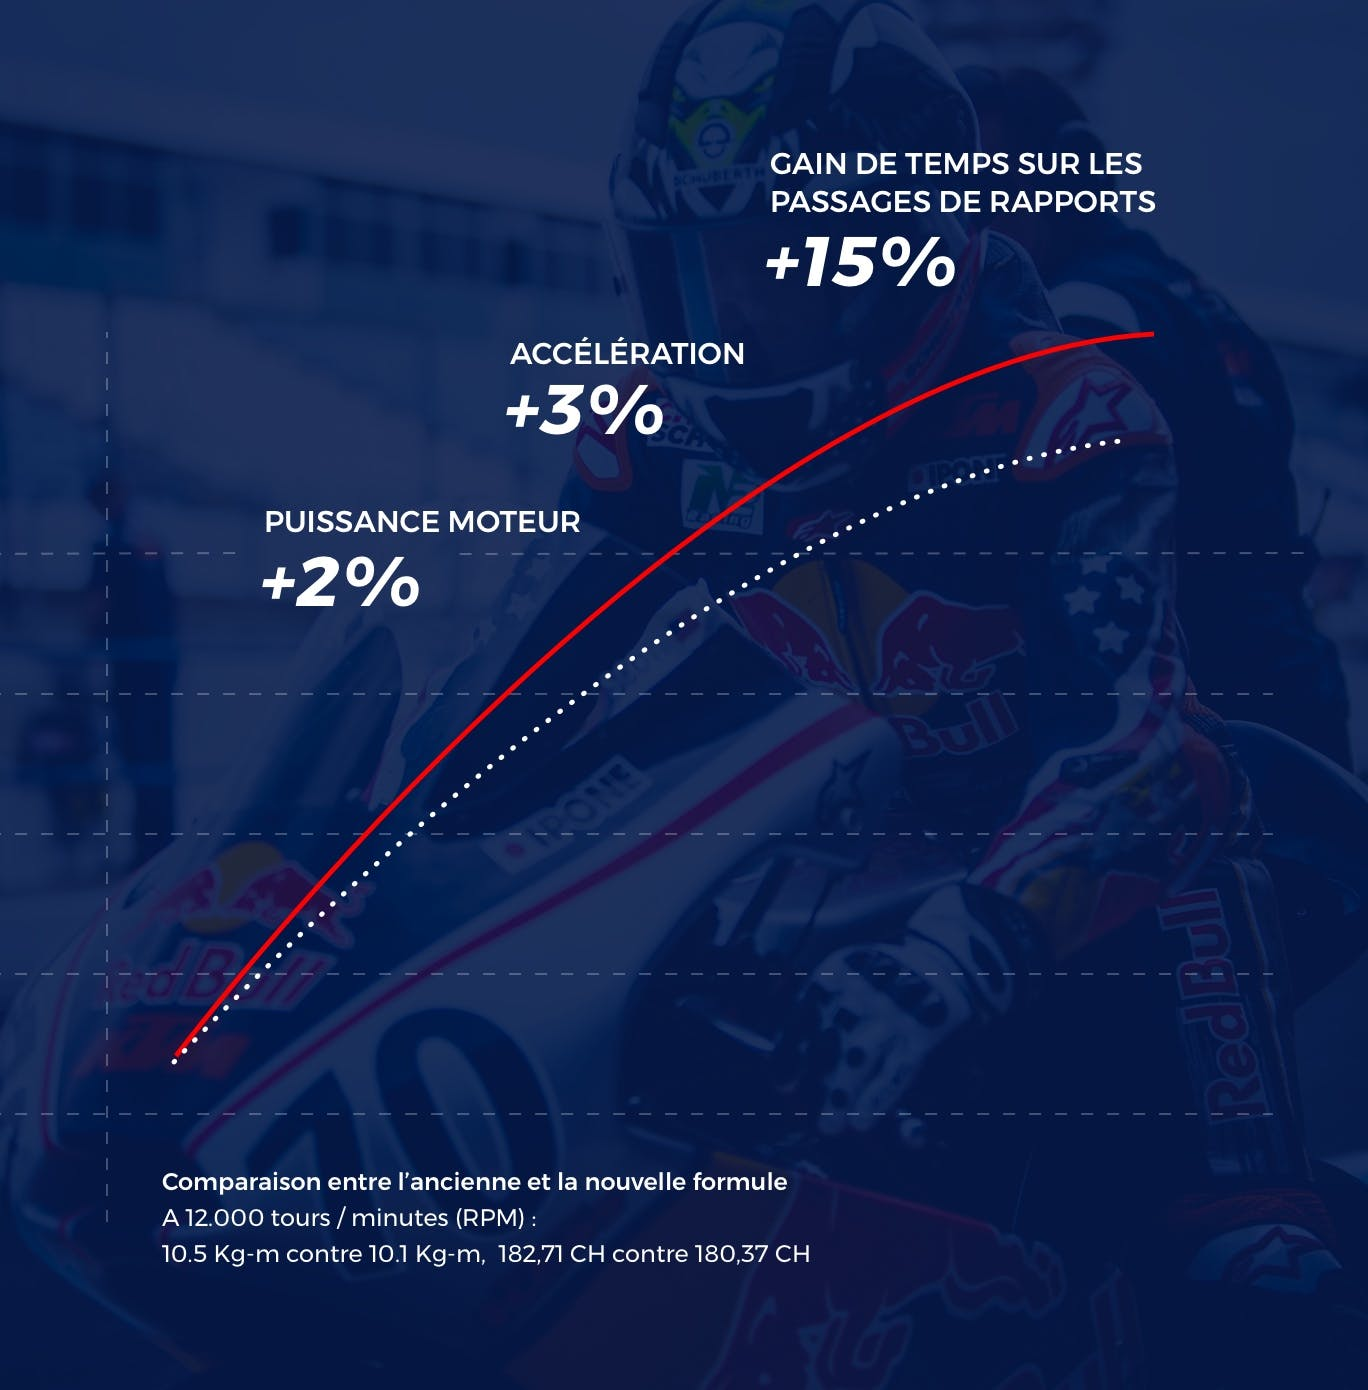 Bénéfices et formulation Stroke 4 racing ipone